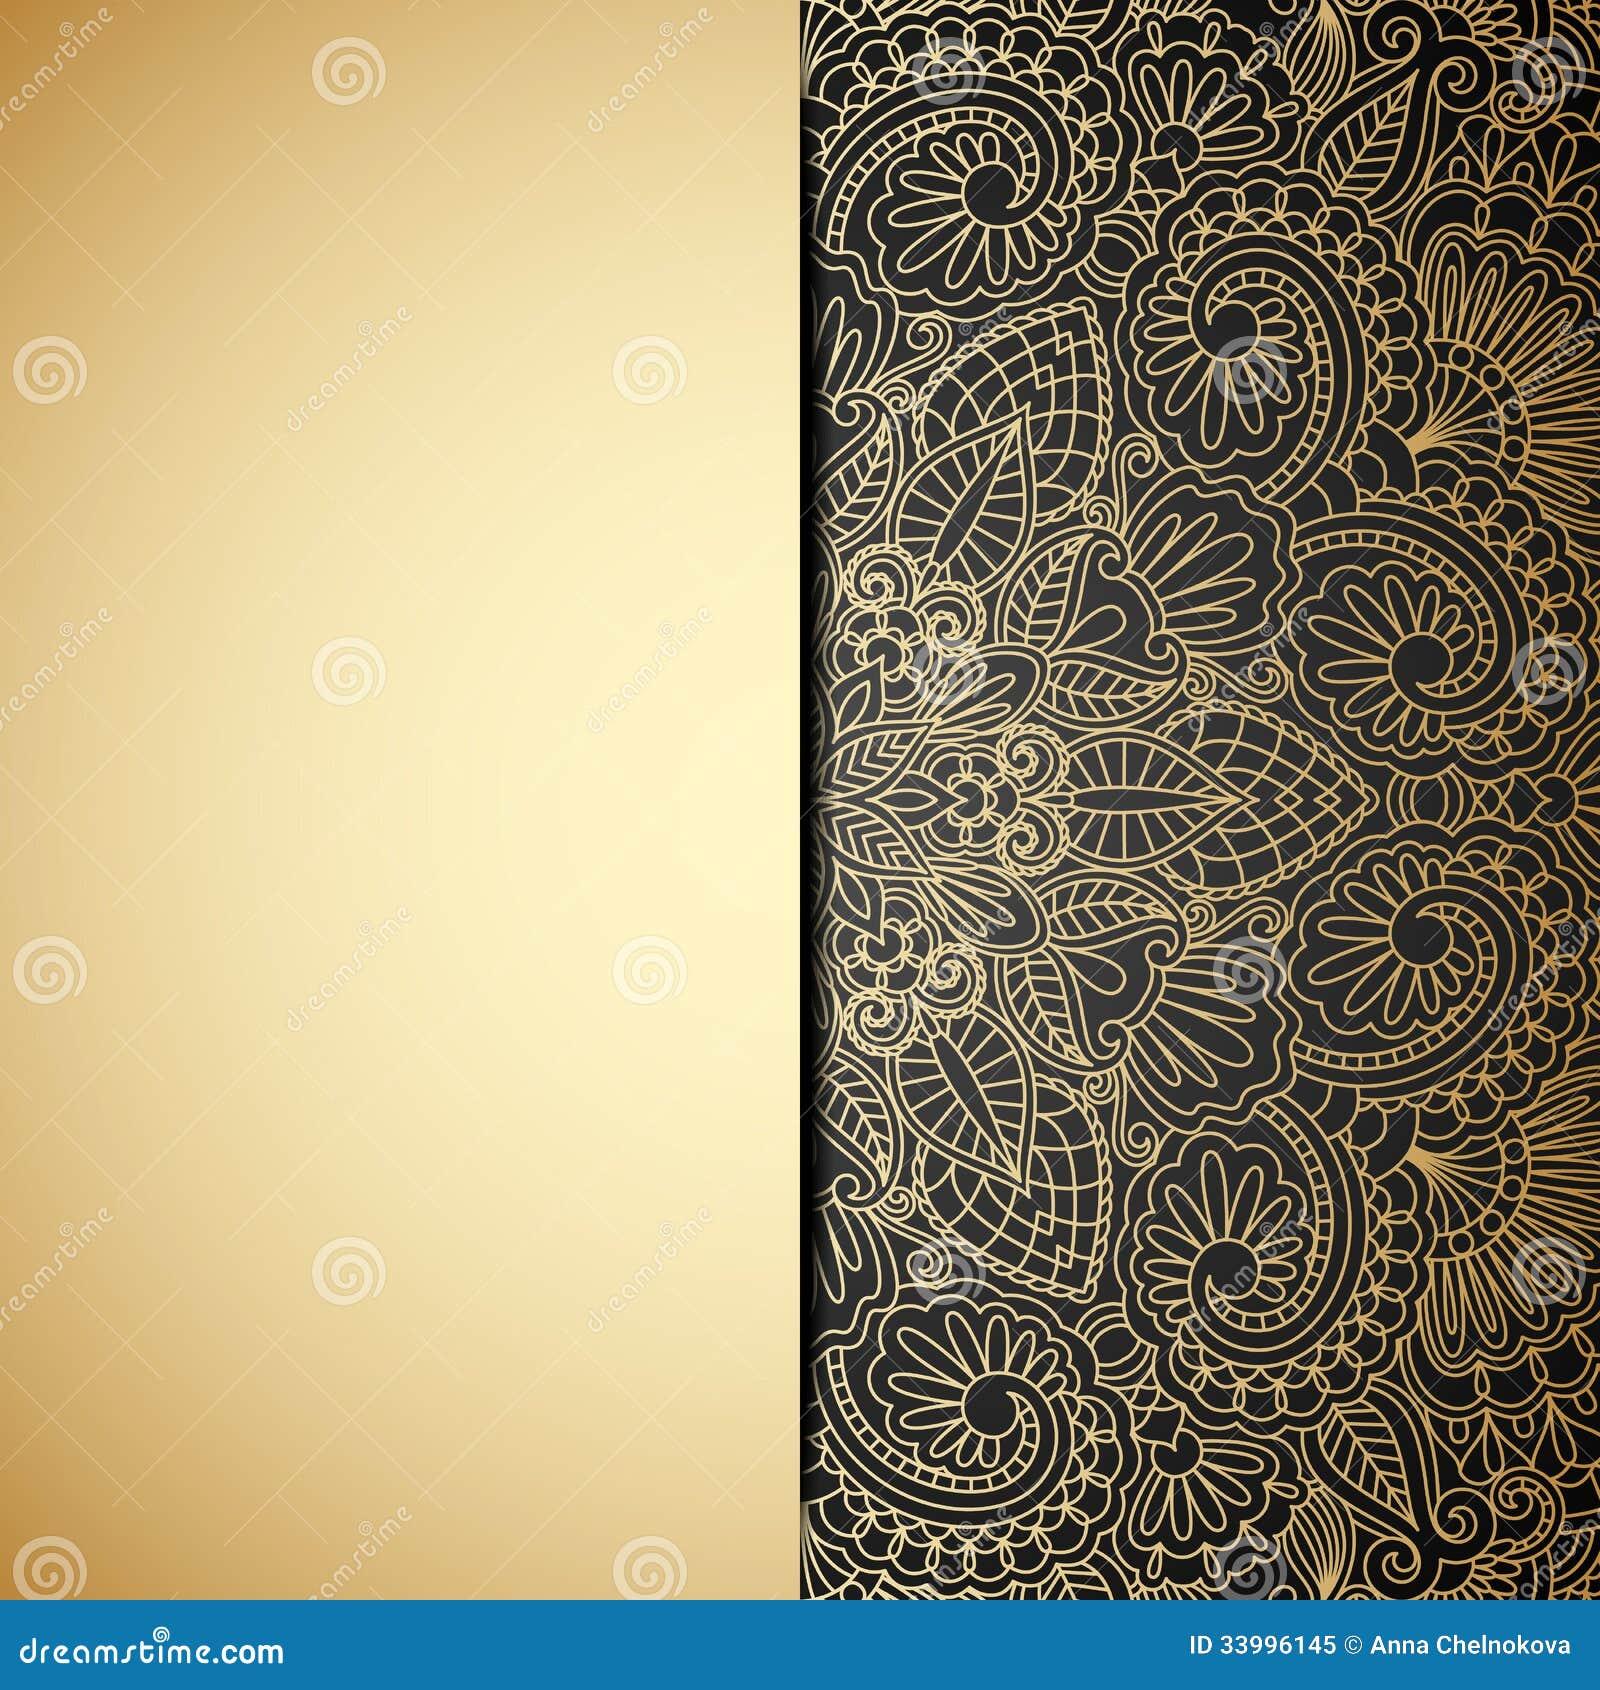 Vintage baroque floral golden ornament vector stock vector image - Vector Gold Ornament Royalty Free Stock Photo Image